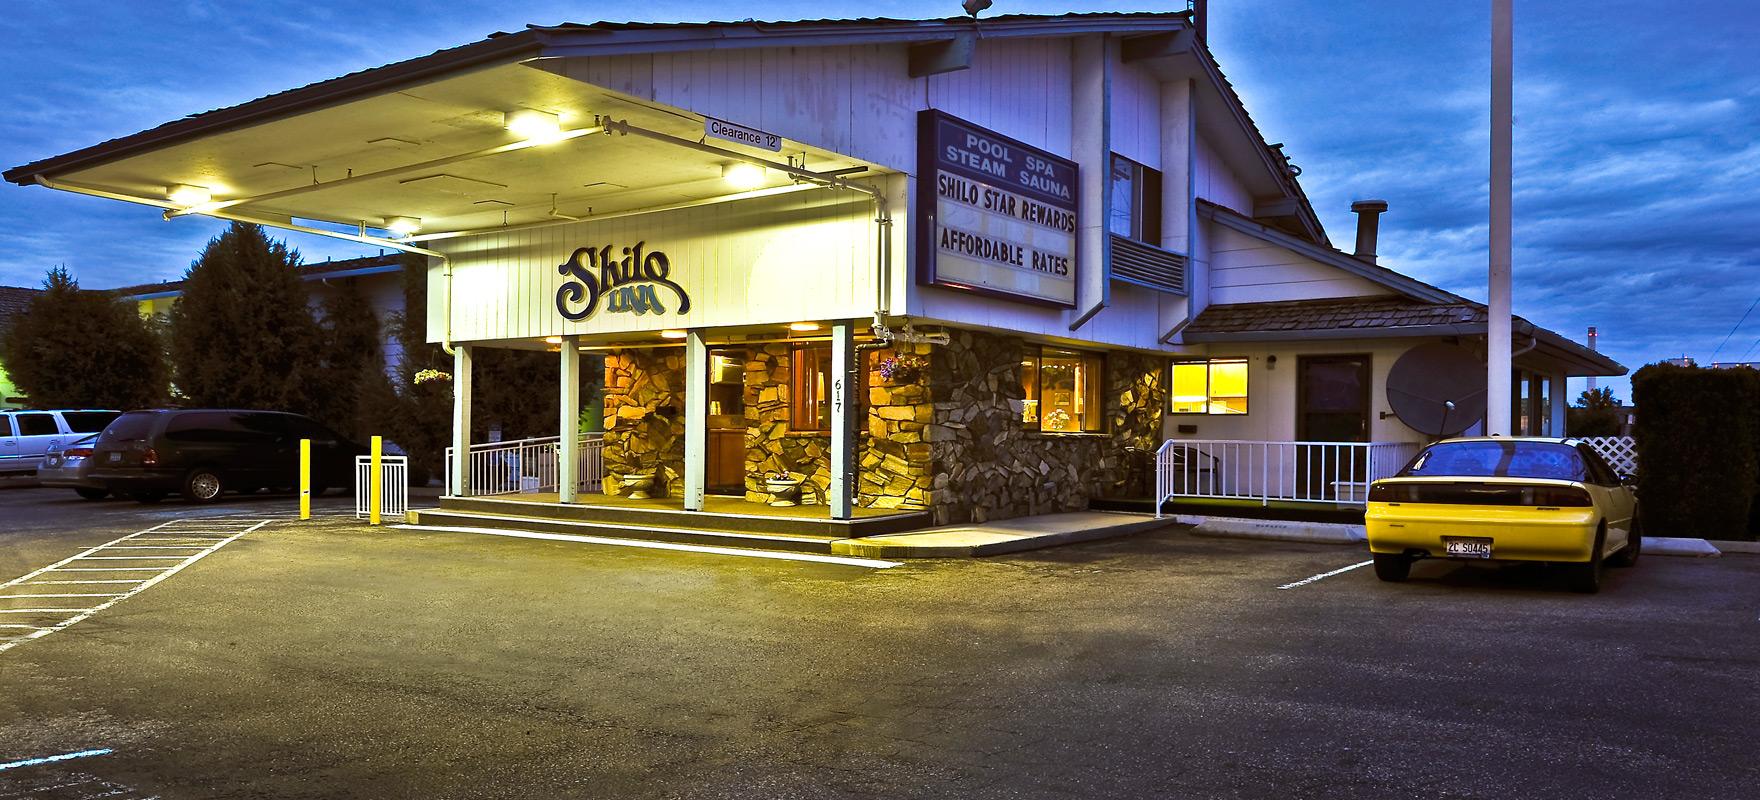 Shilo Inns Suites Hotels Nampa Idaho